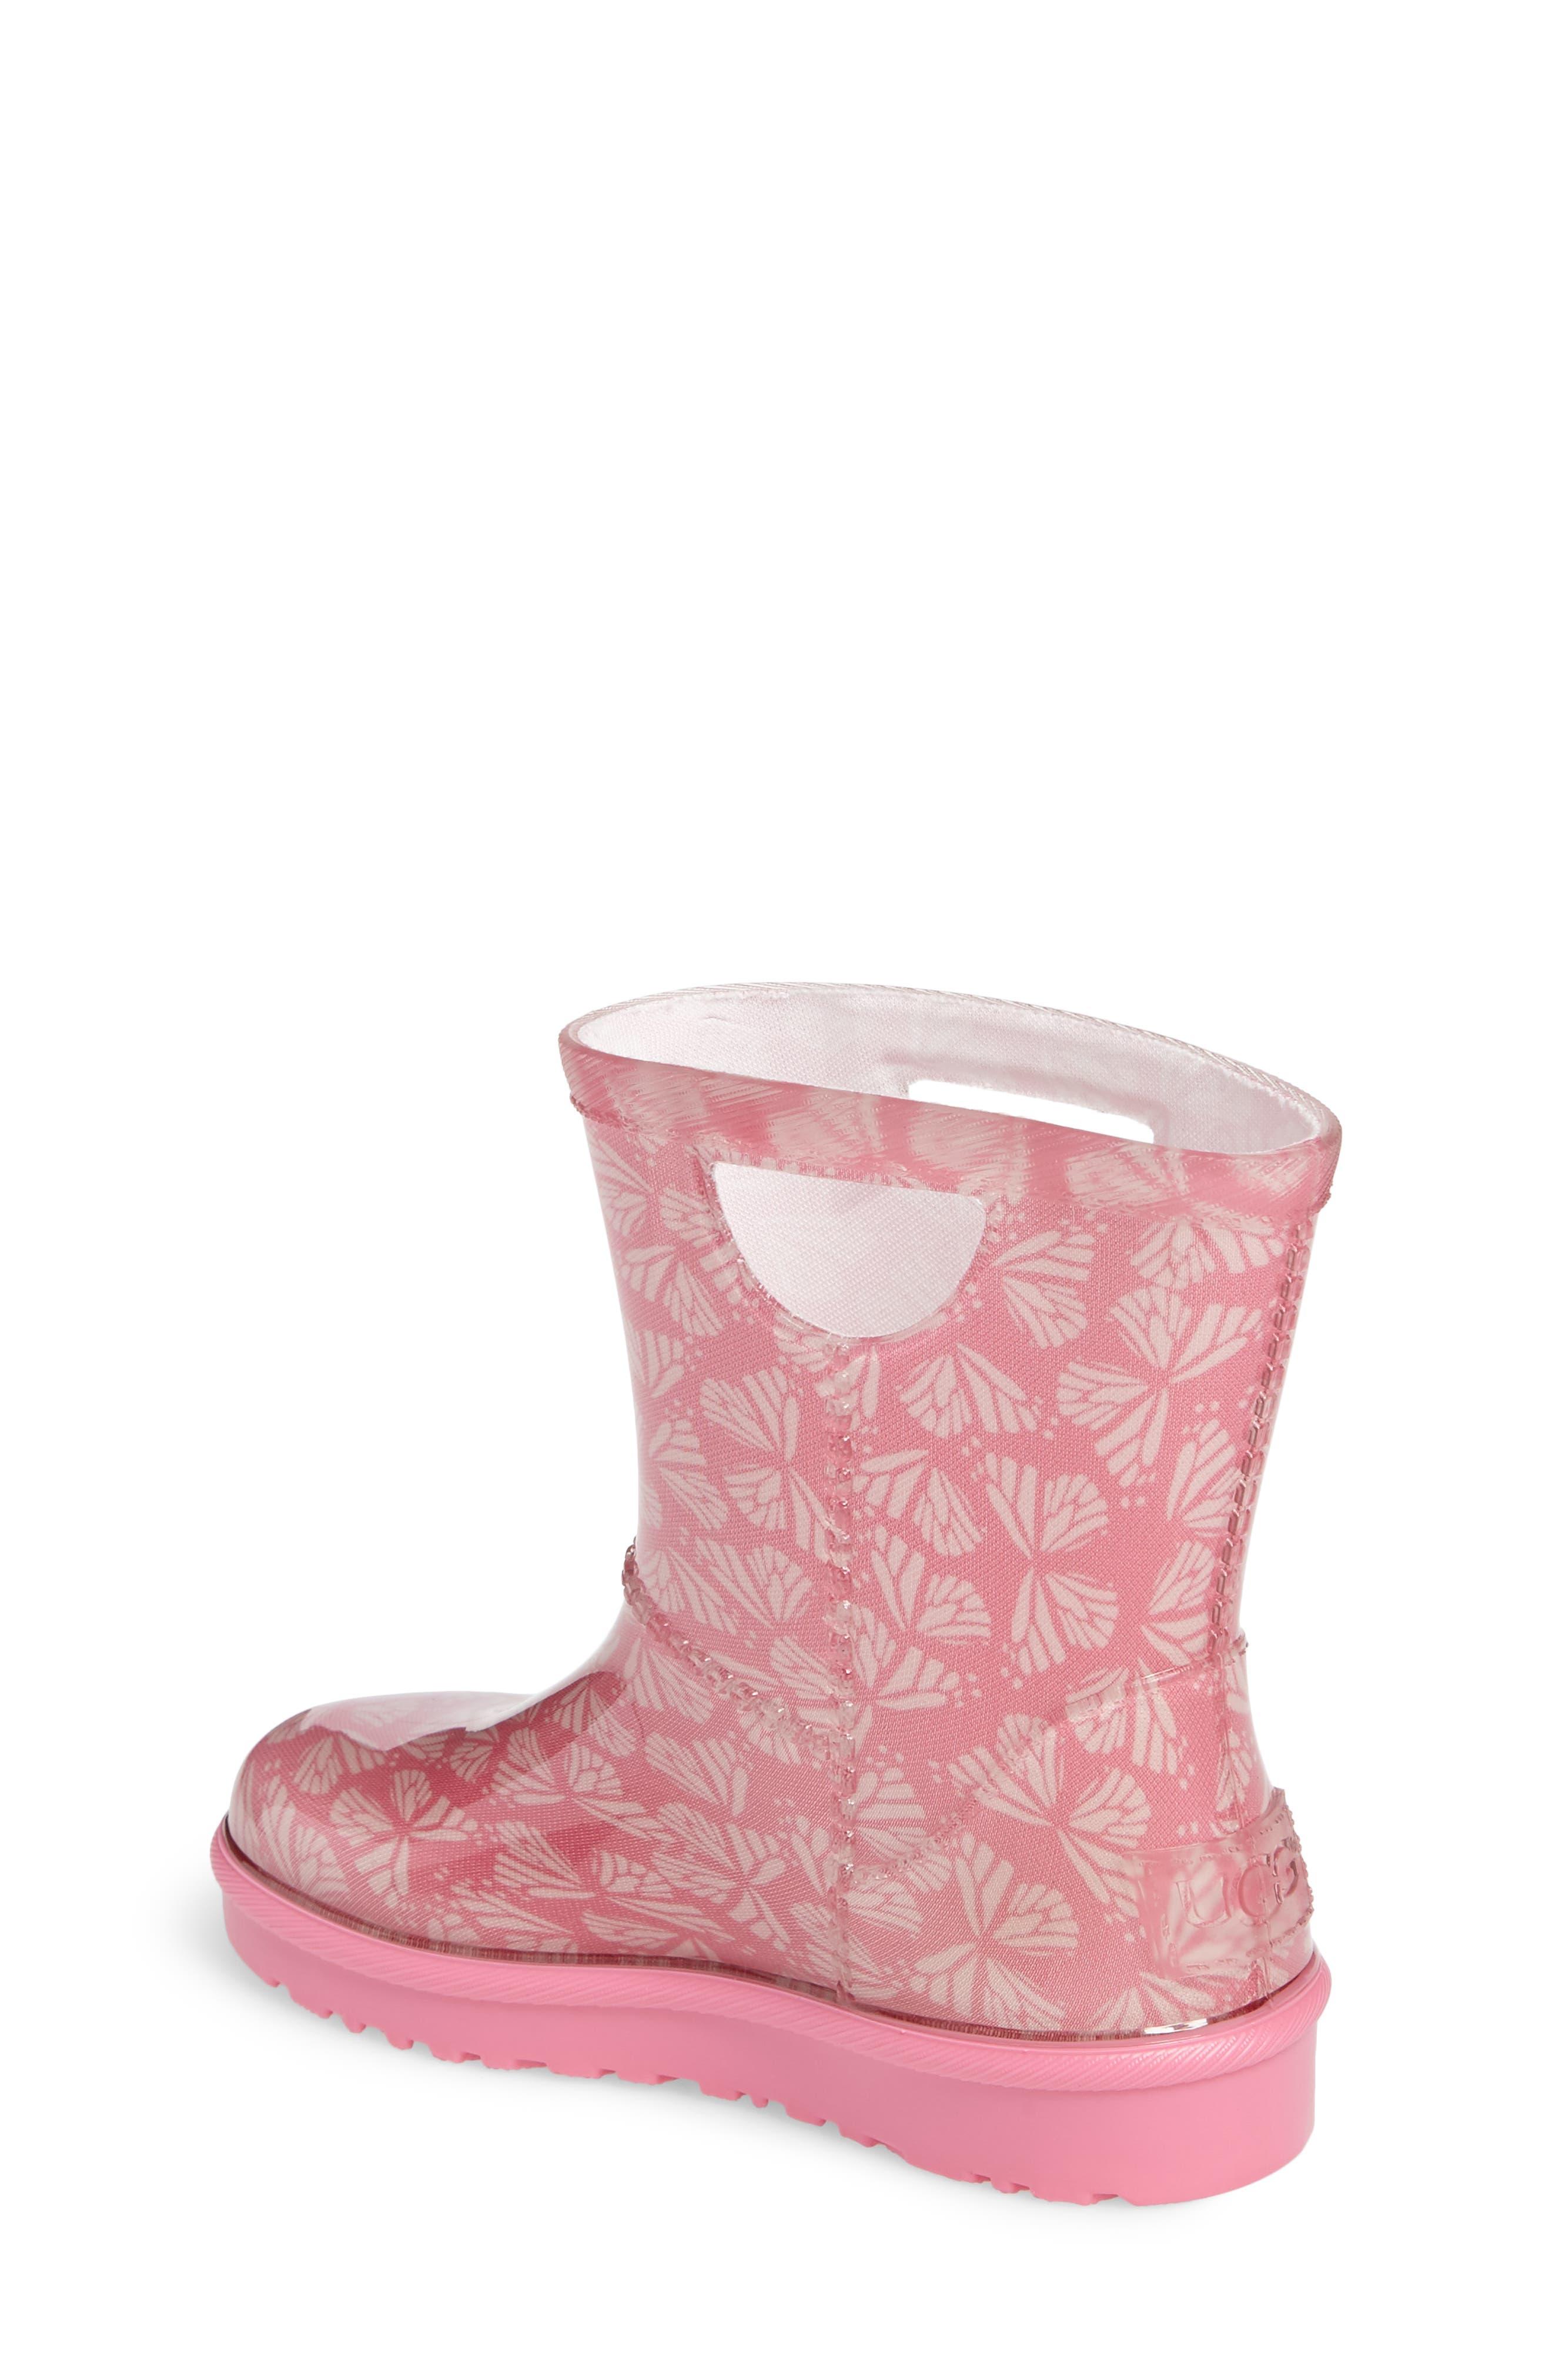 Rahjee Rain Boot,                             Alternate thumbnail 2, color,                             Pink Azalea